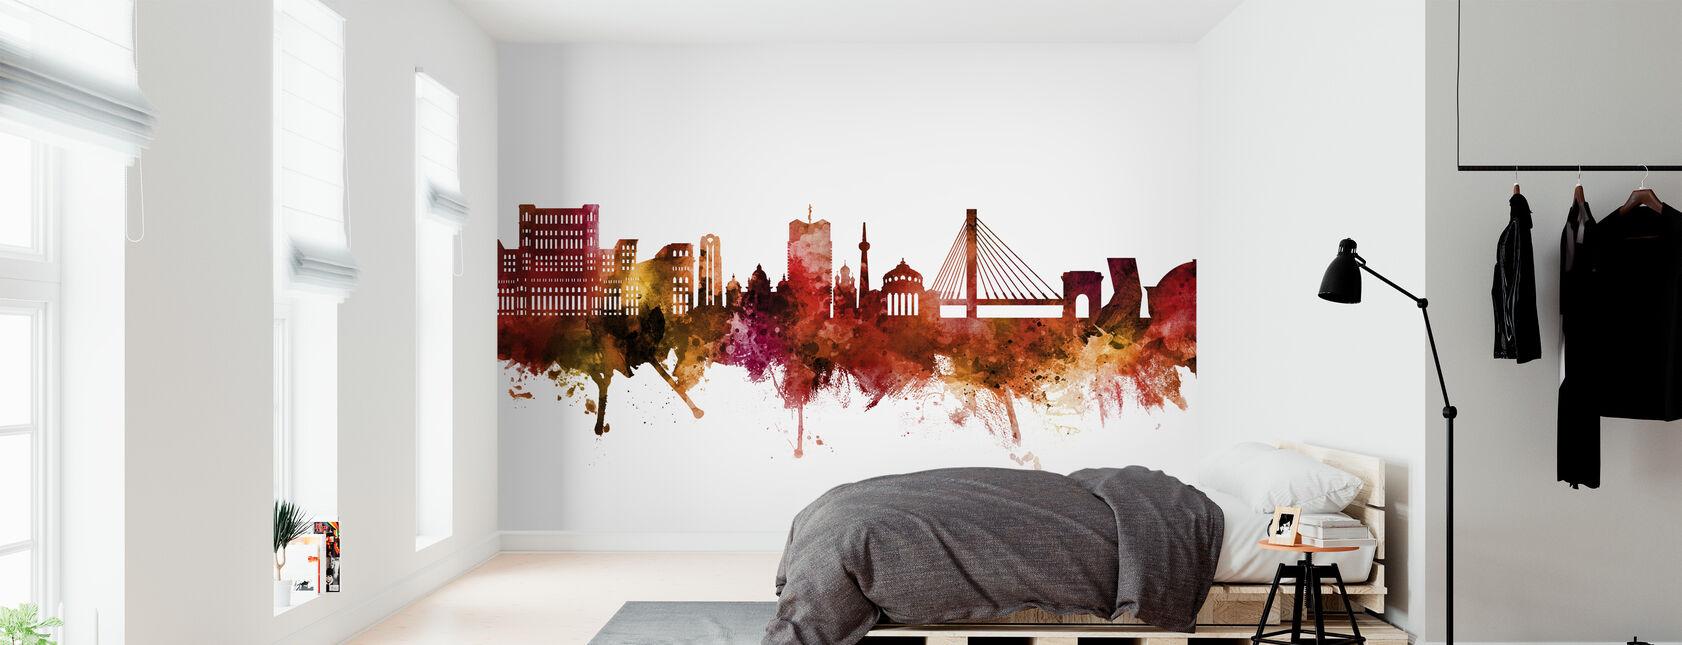 Bucharest Romania Skyline - Wallpaper - Bedroom